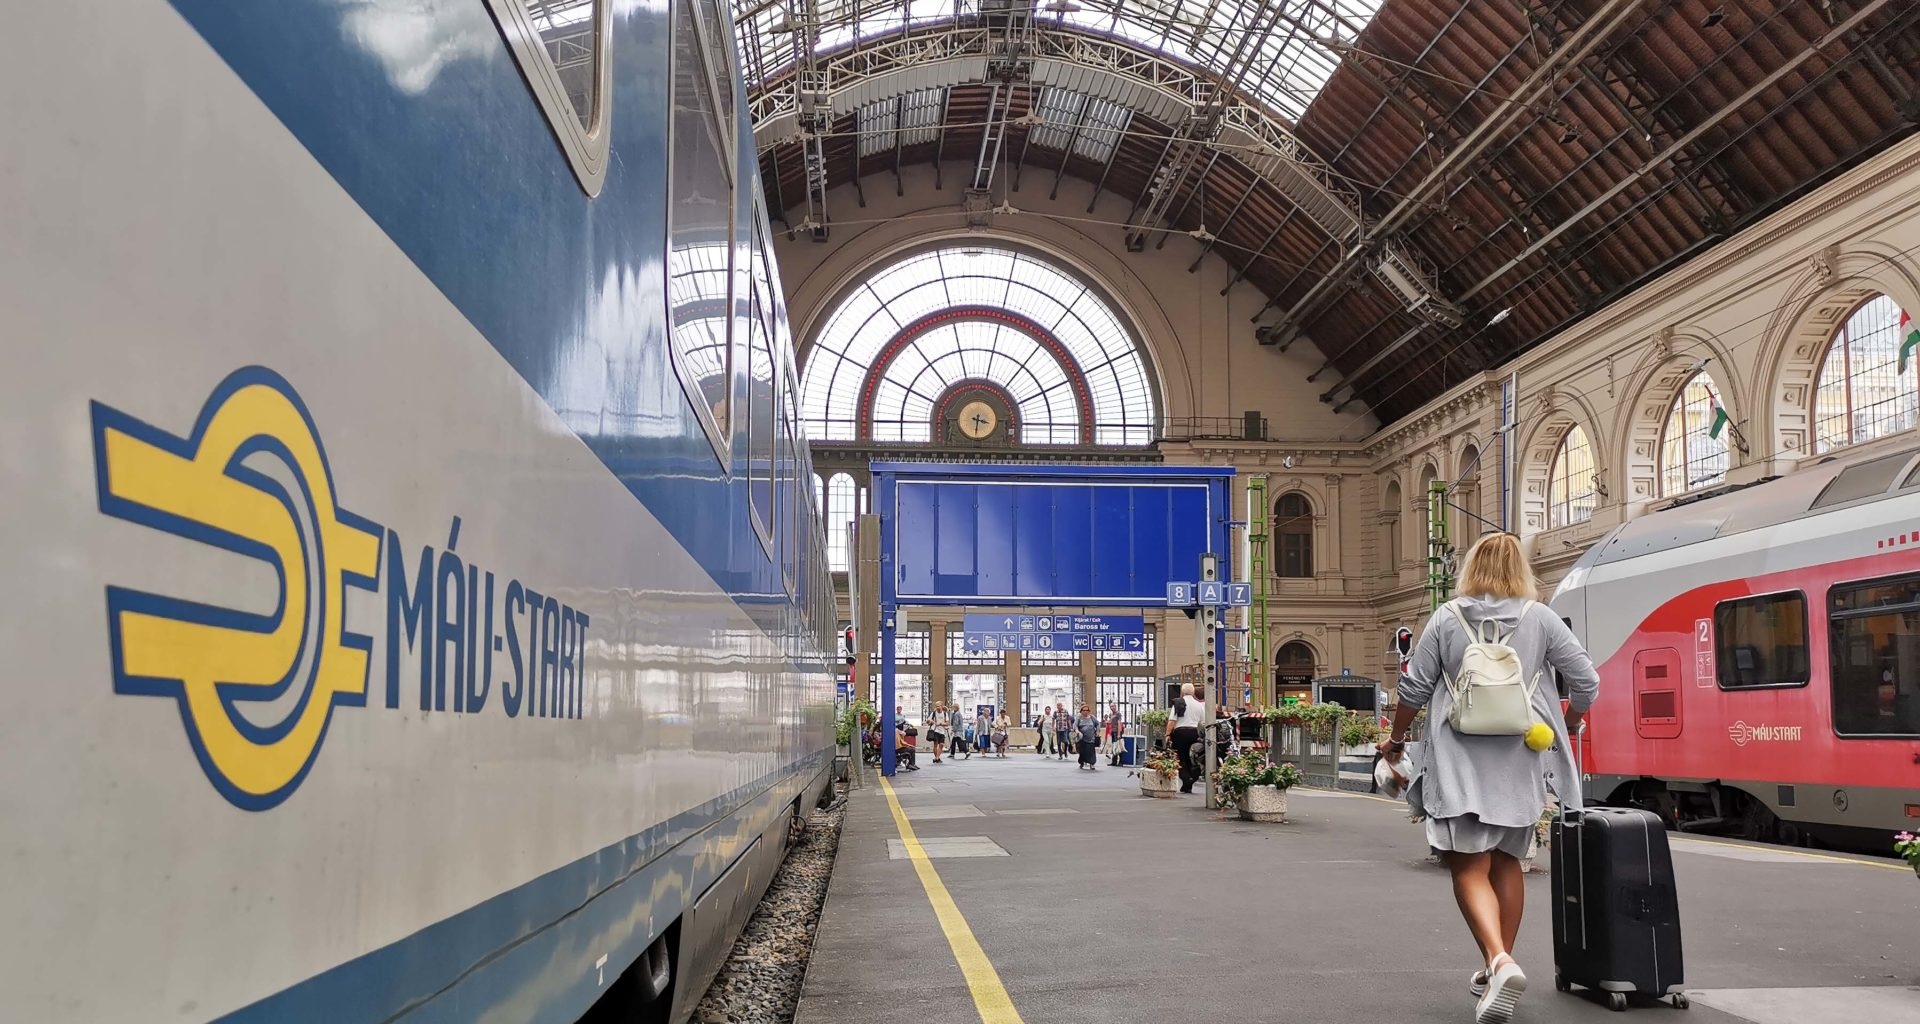 Keleti railway station Budapest train MÁV